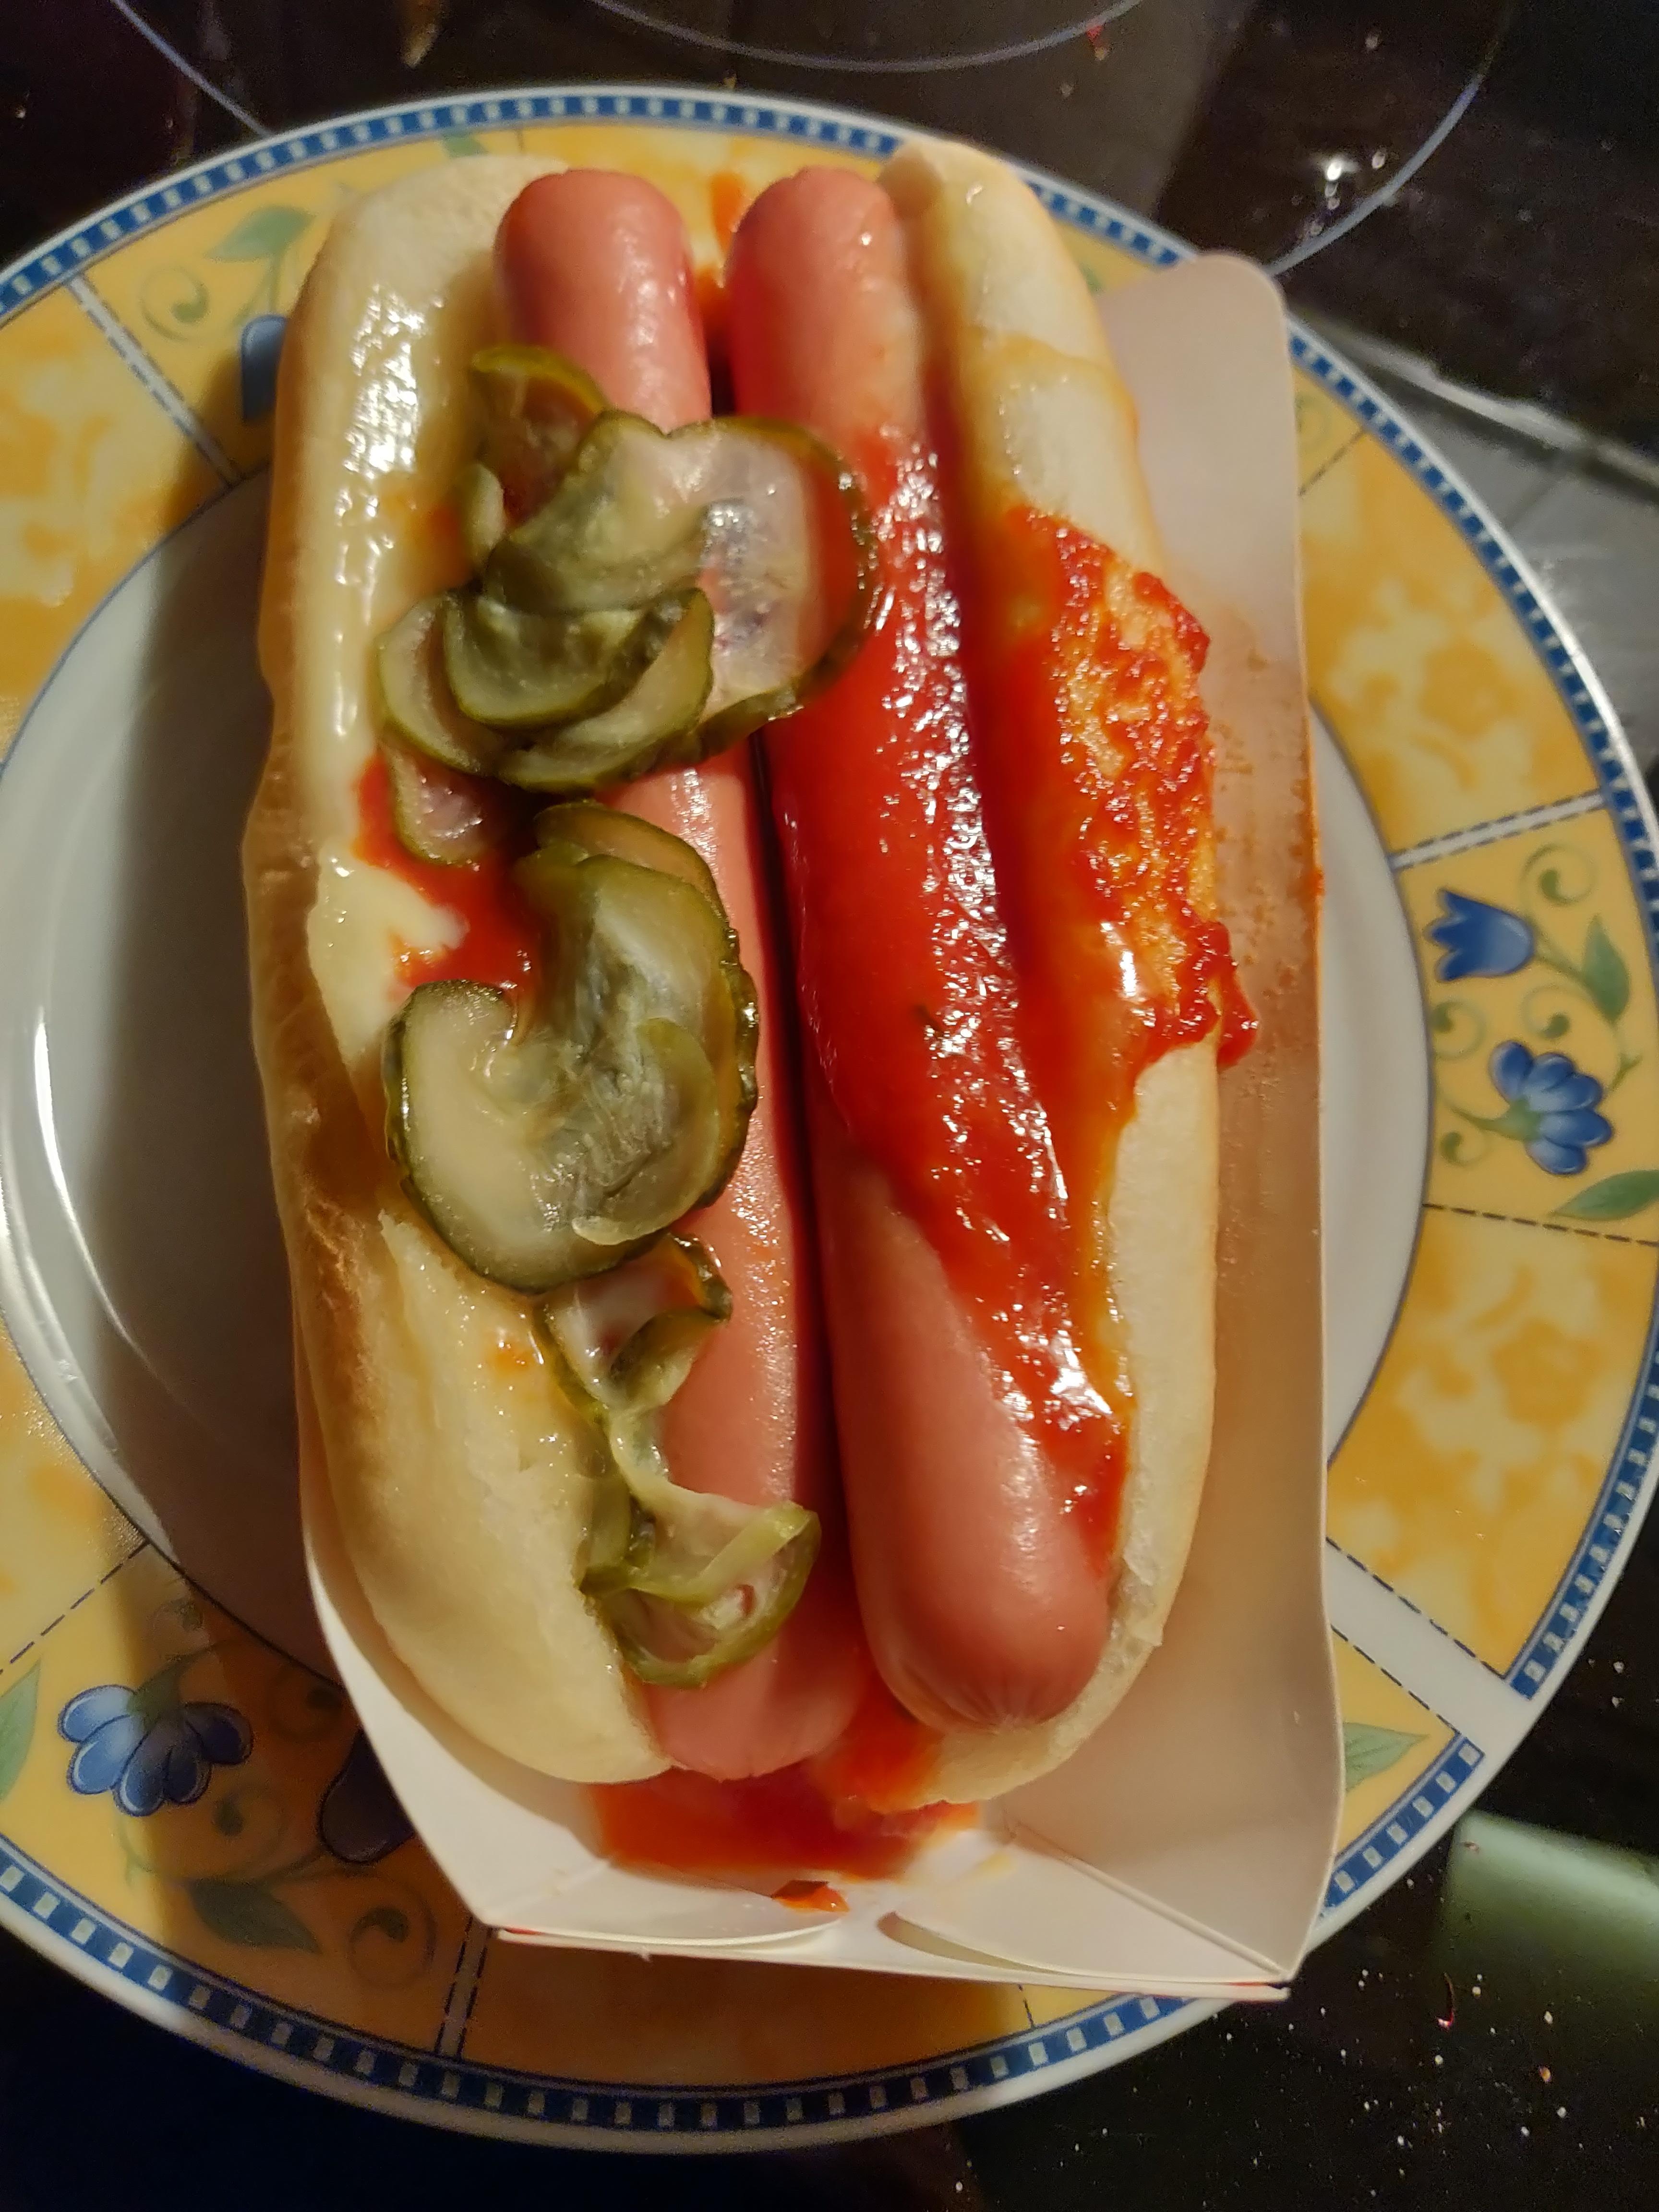 double dog microwave hot dog shittyfoodporn